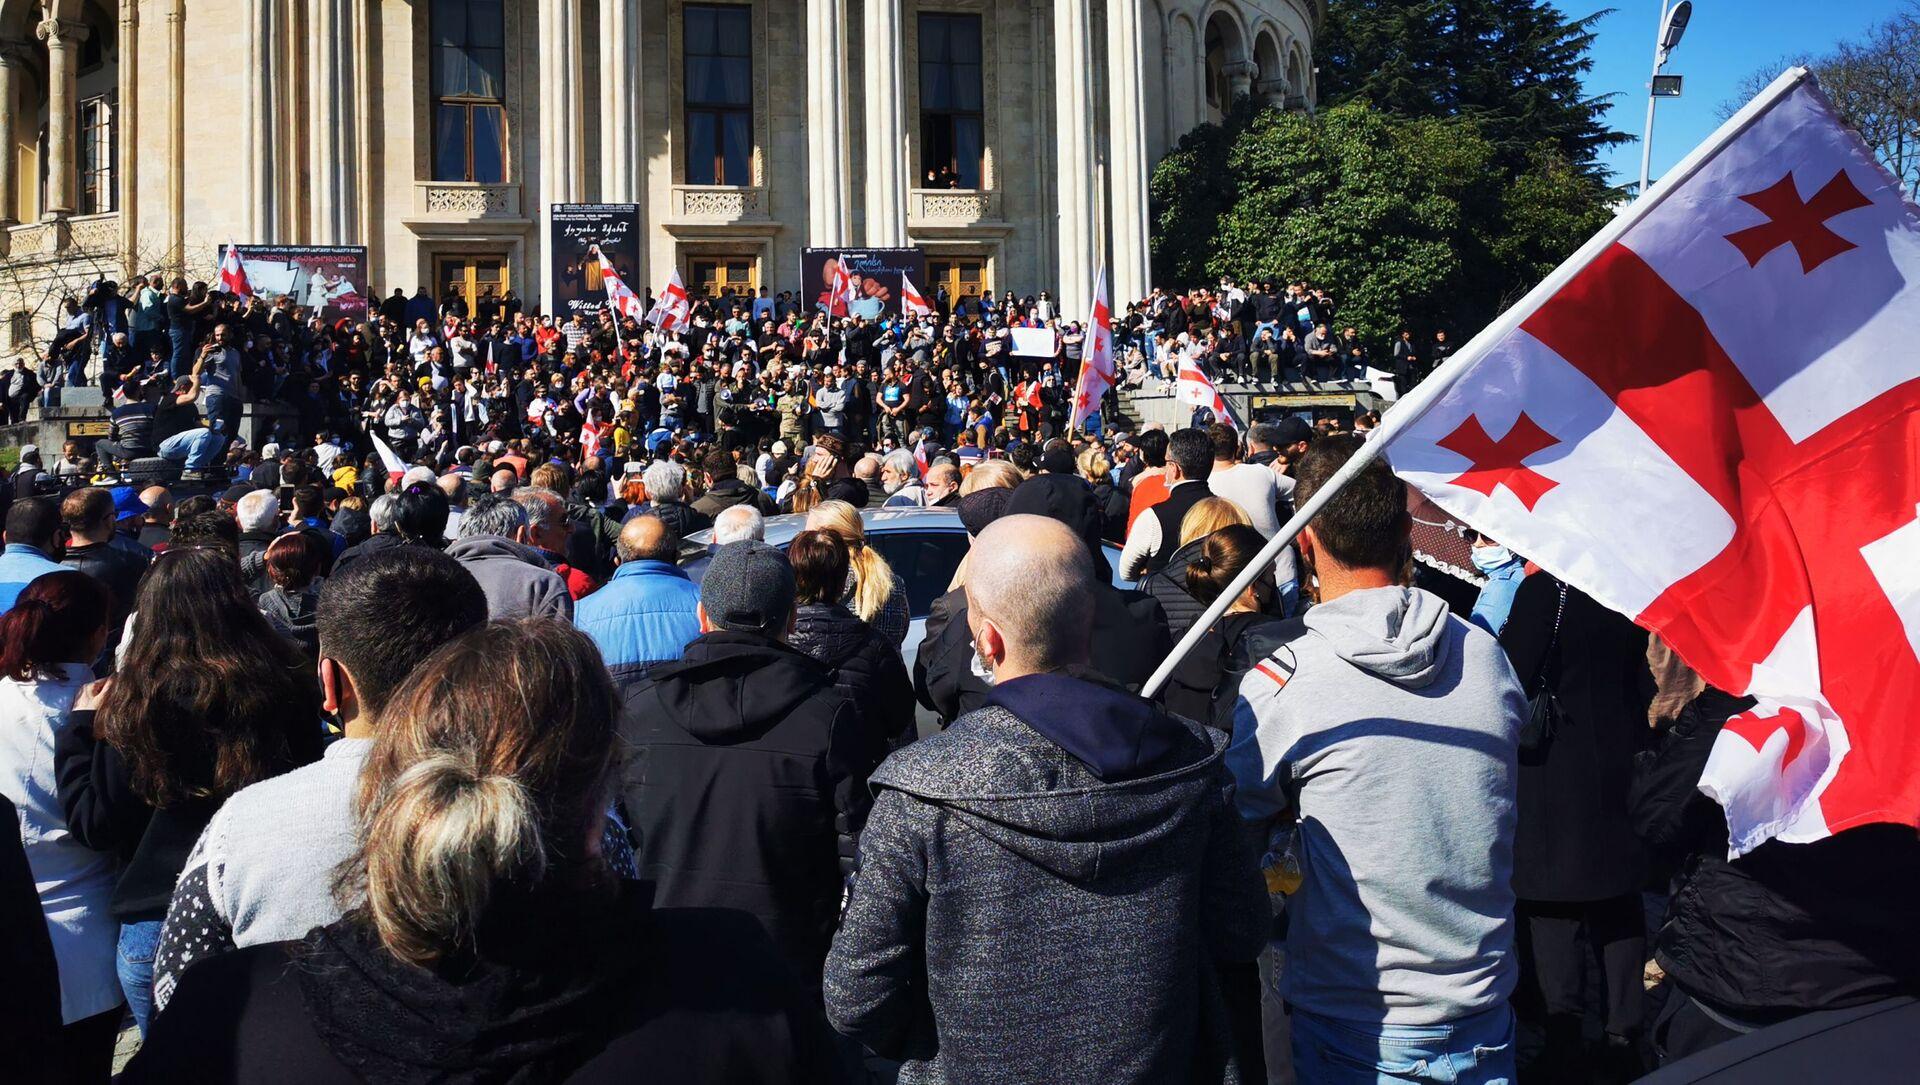 Акция протеста против строительства Намахвани ГЭС в центре Кутаиси 14 апреля 2021 года - Sputnik Грузия, 1920, 15.04.2021